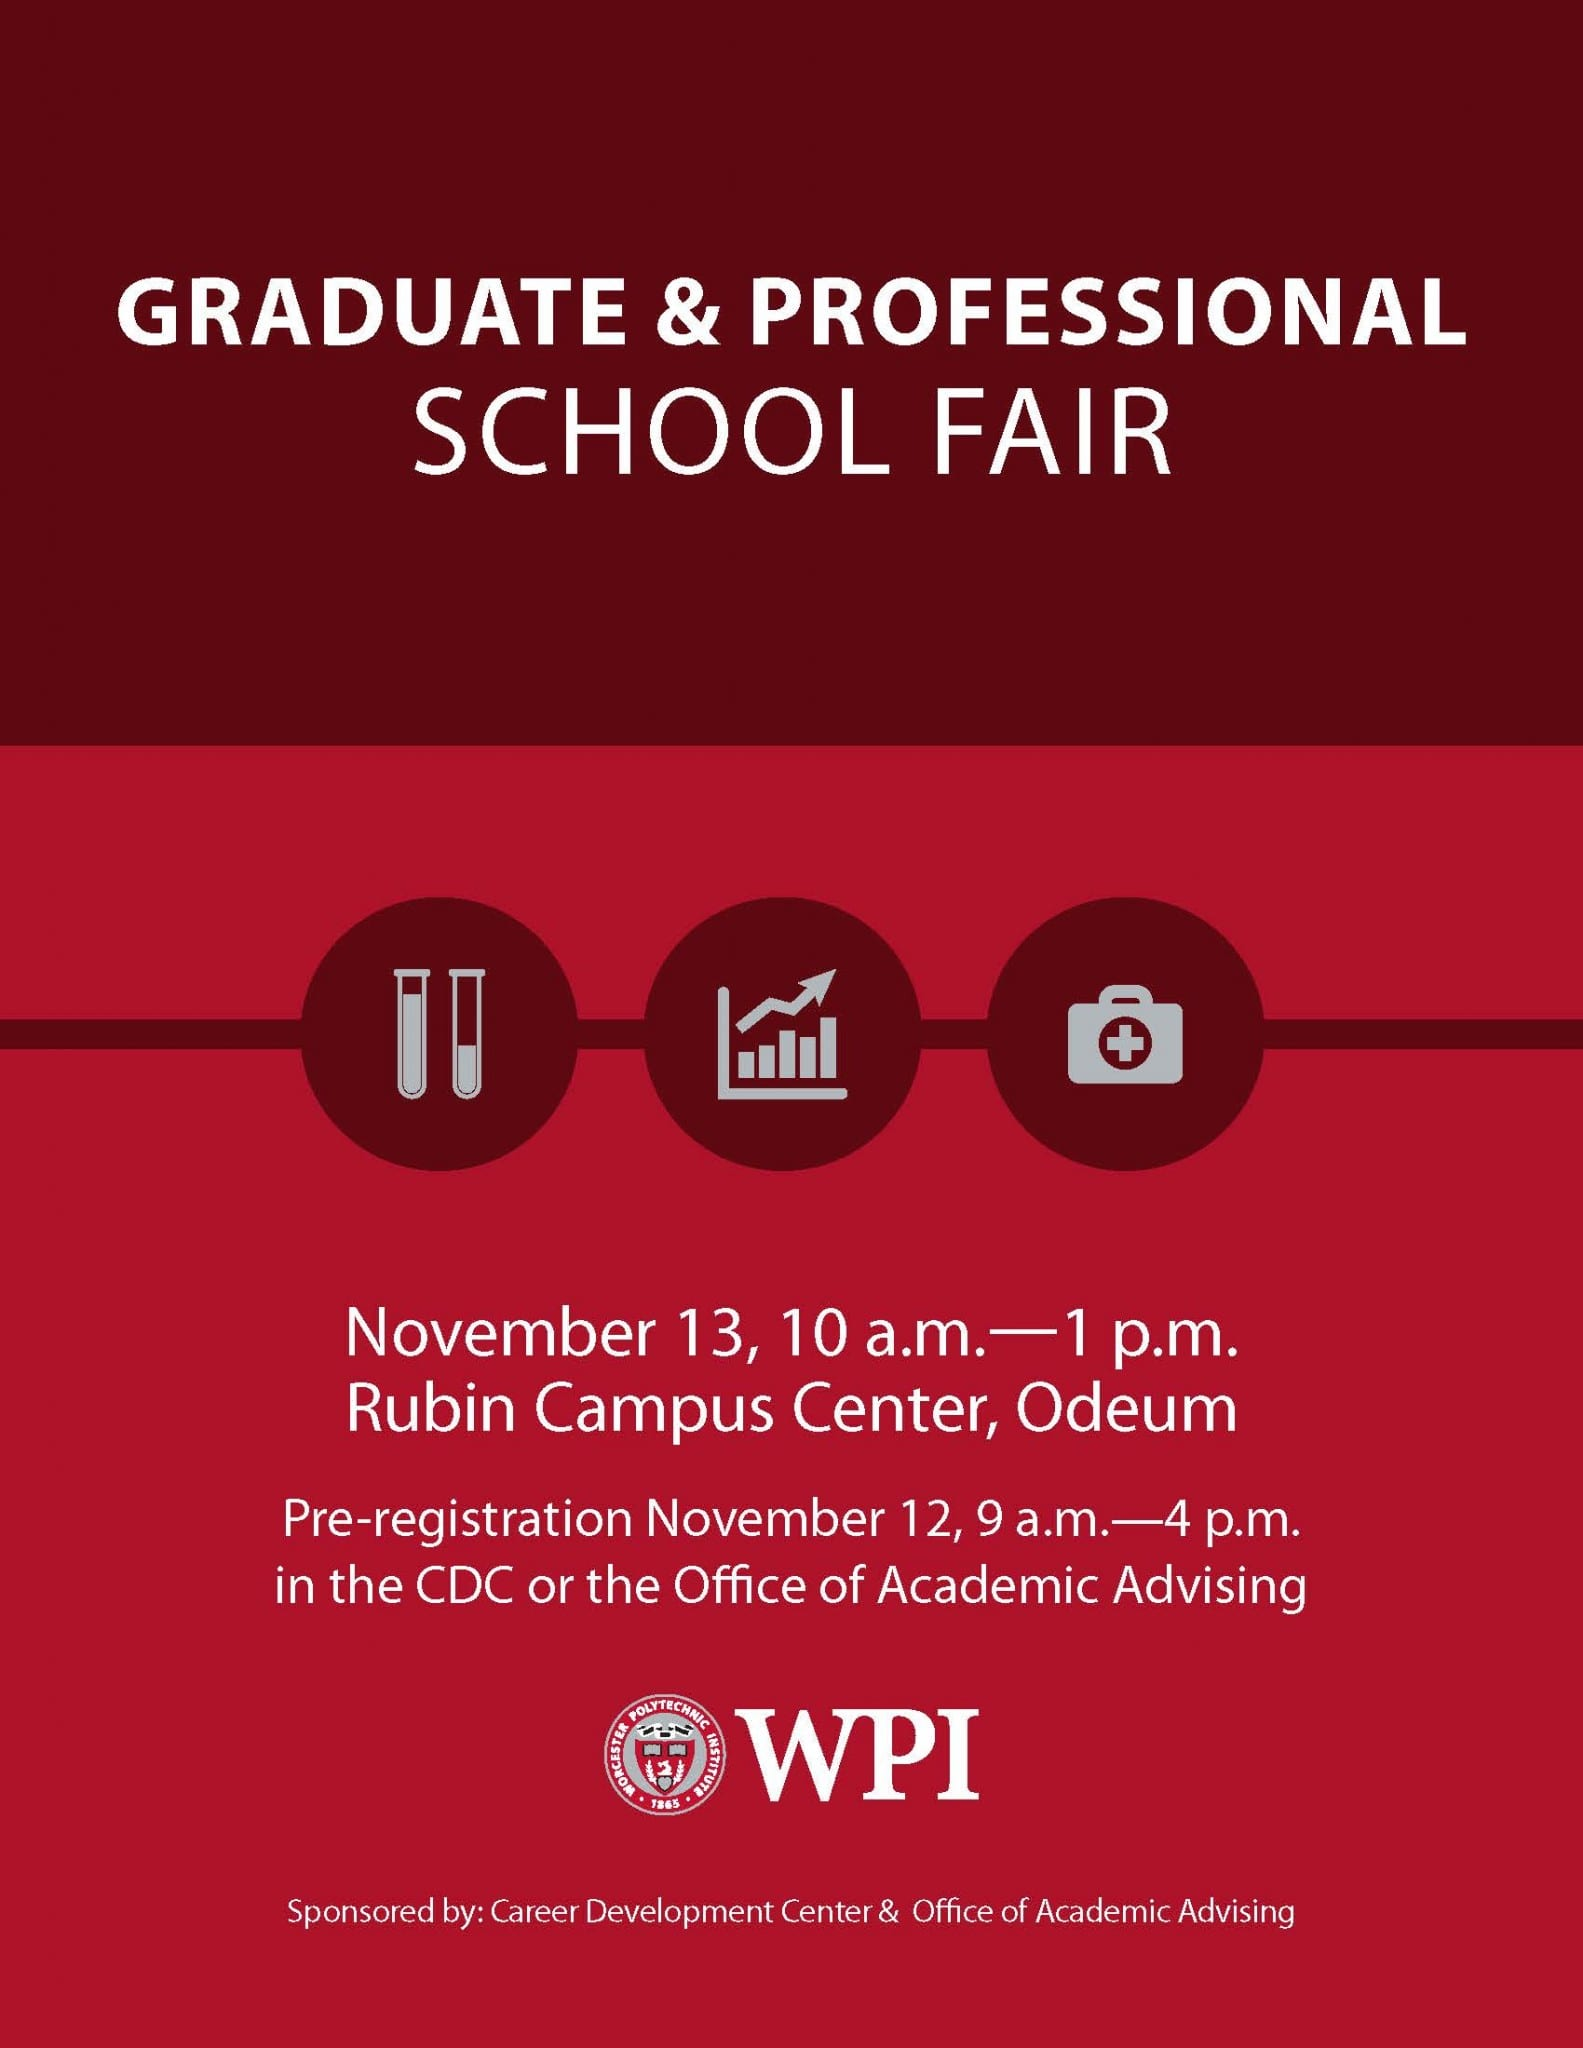 Upcoming Graduate & Professional School Fair